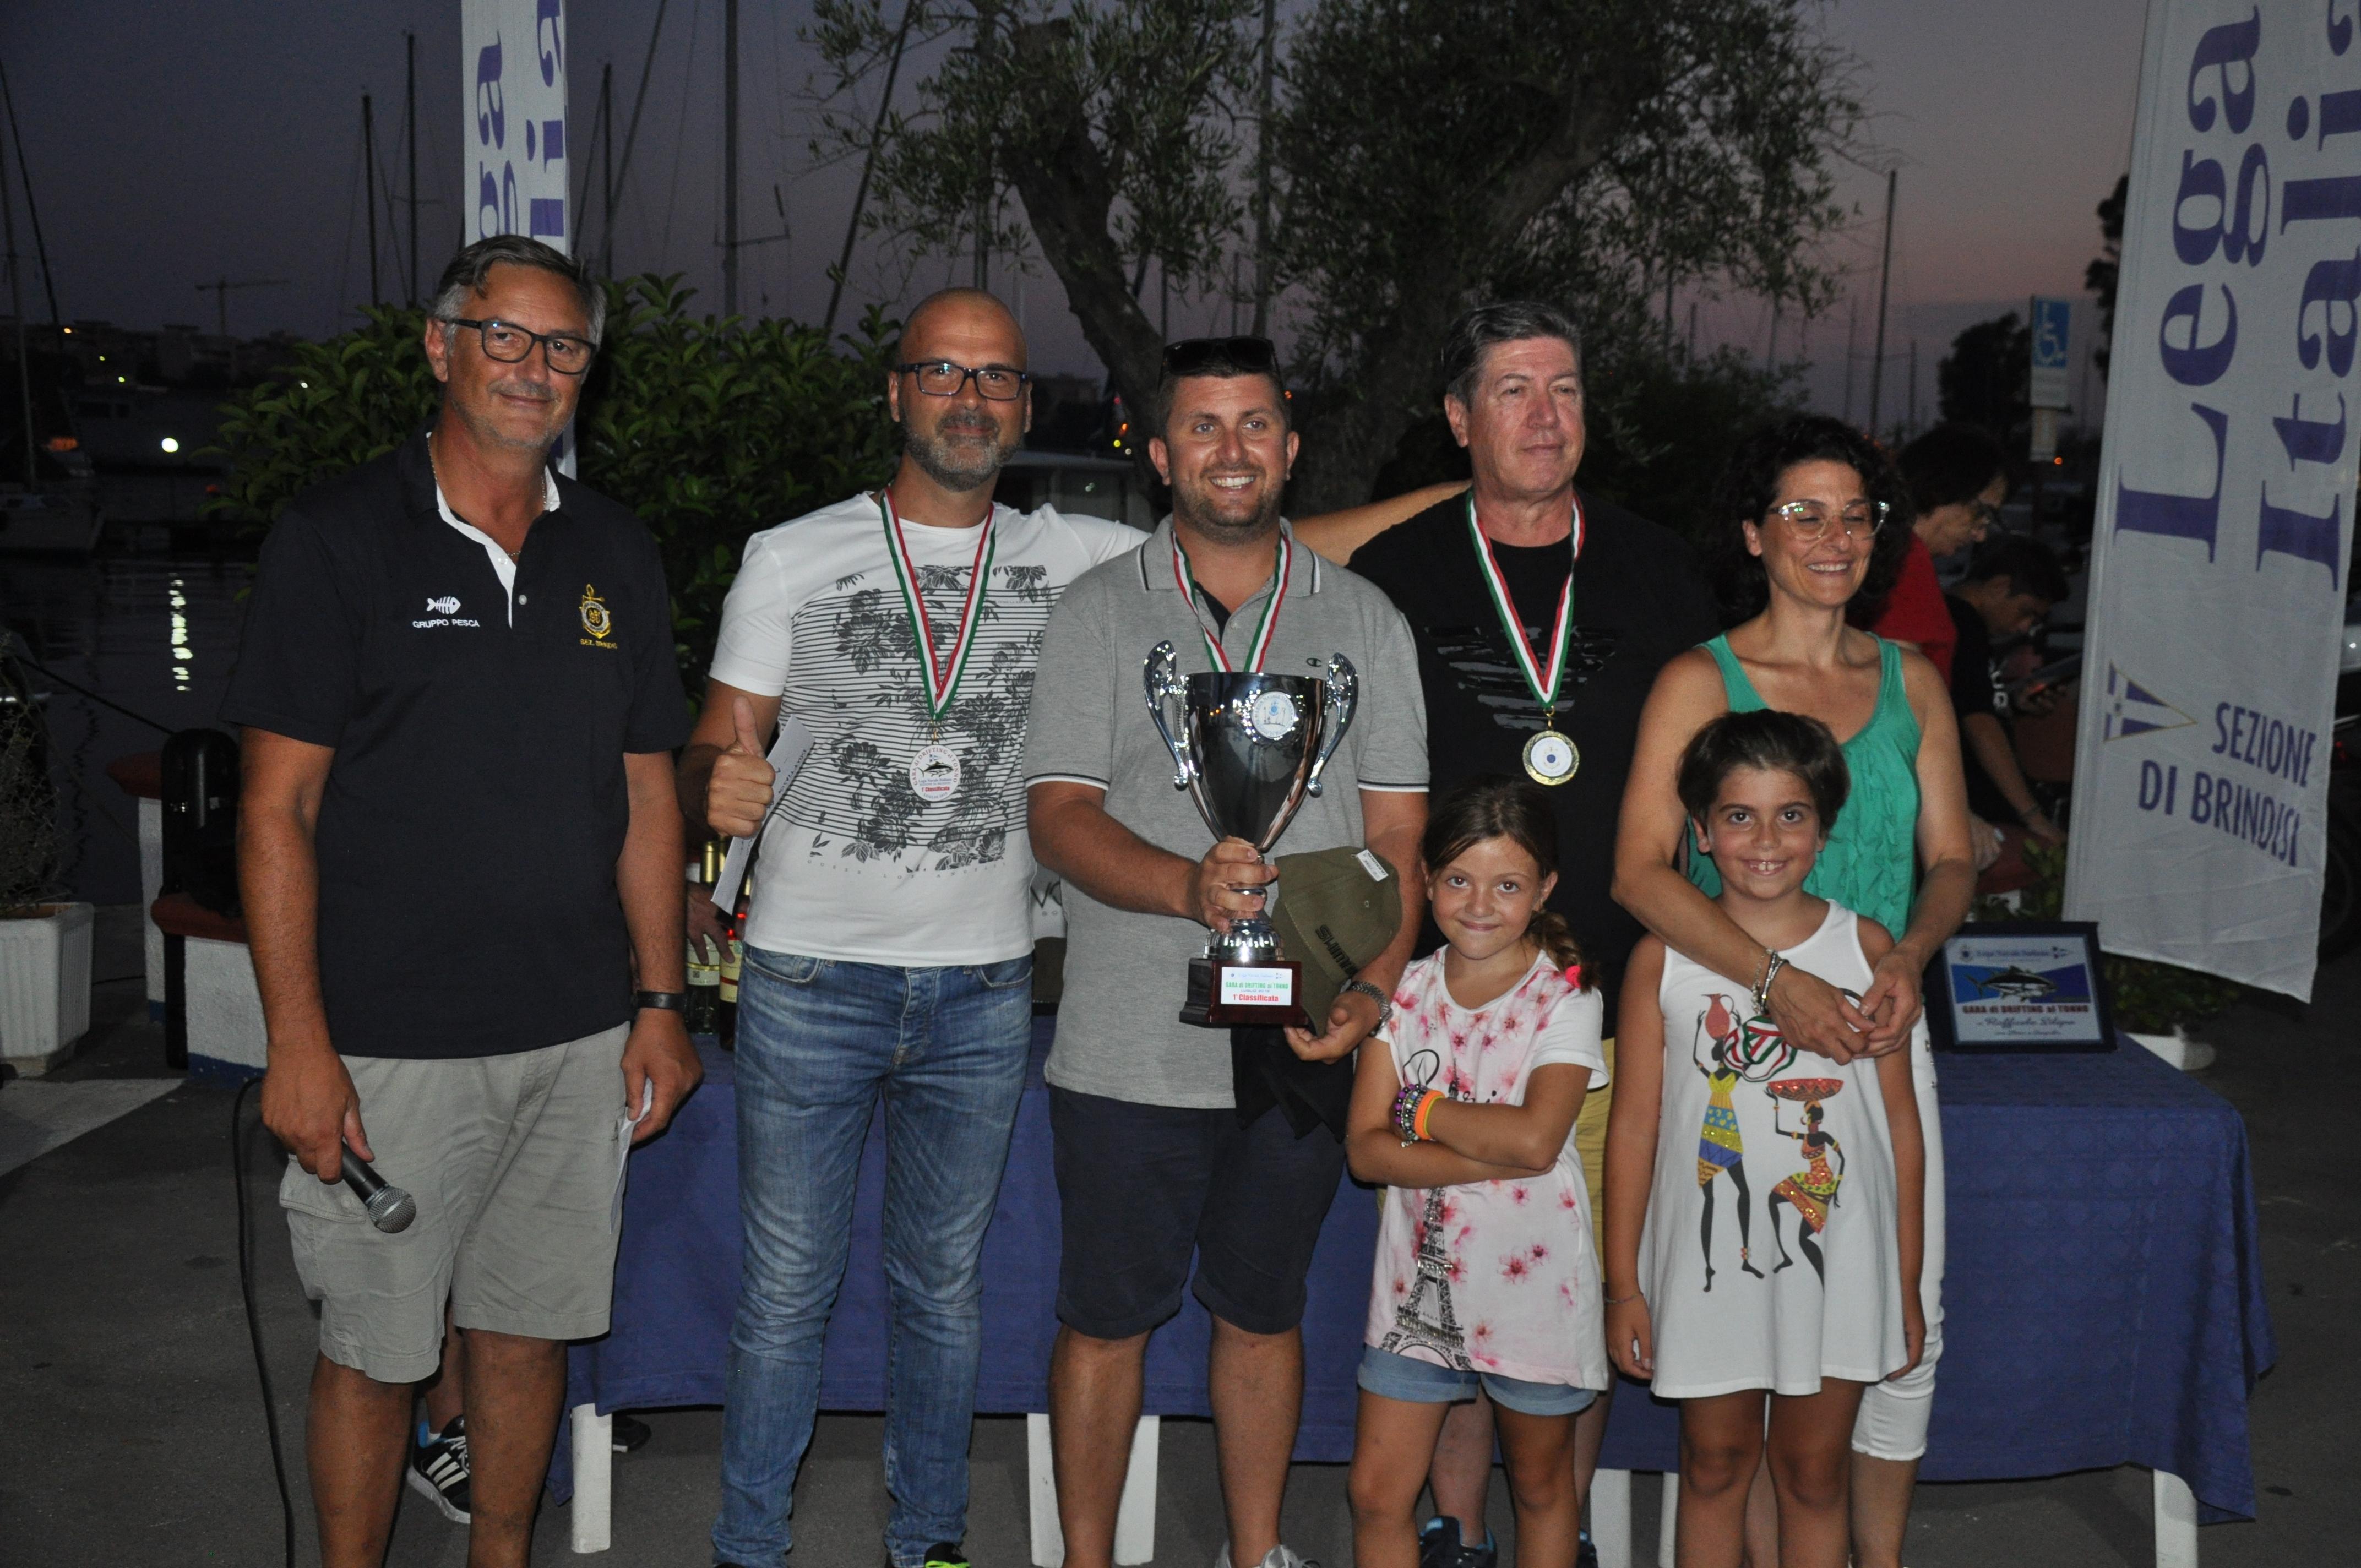 premiazione drifting al tonno 2018 (19)